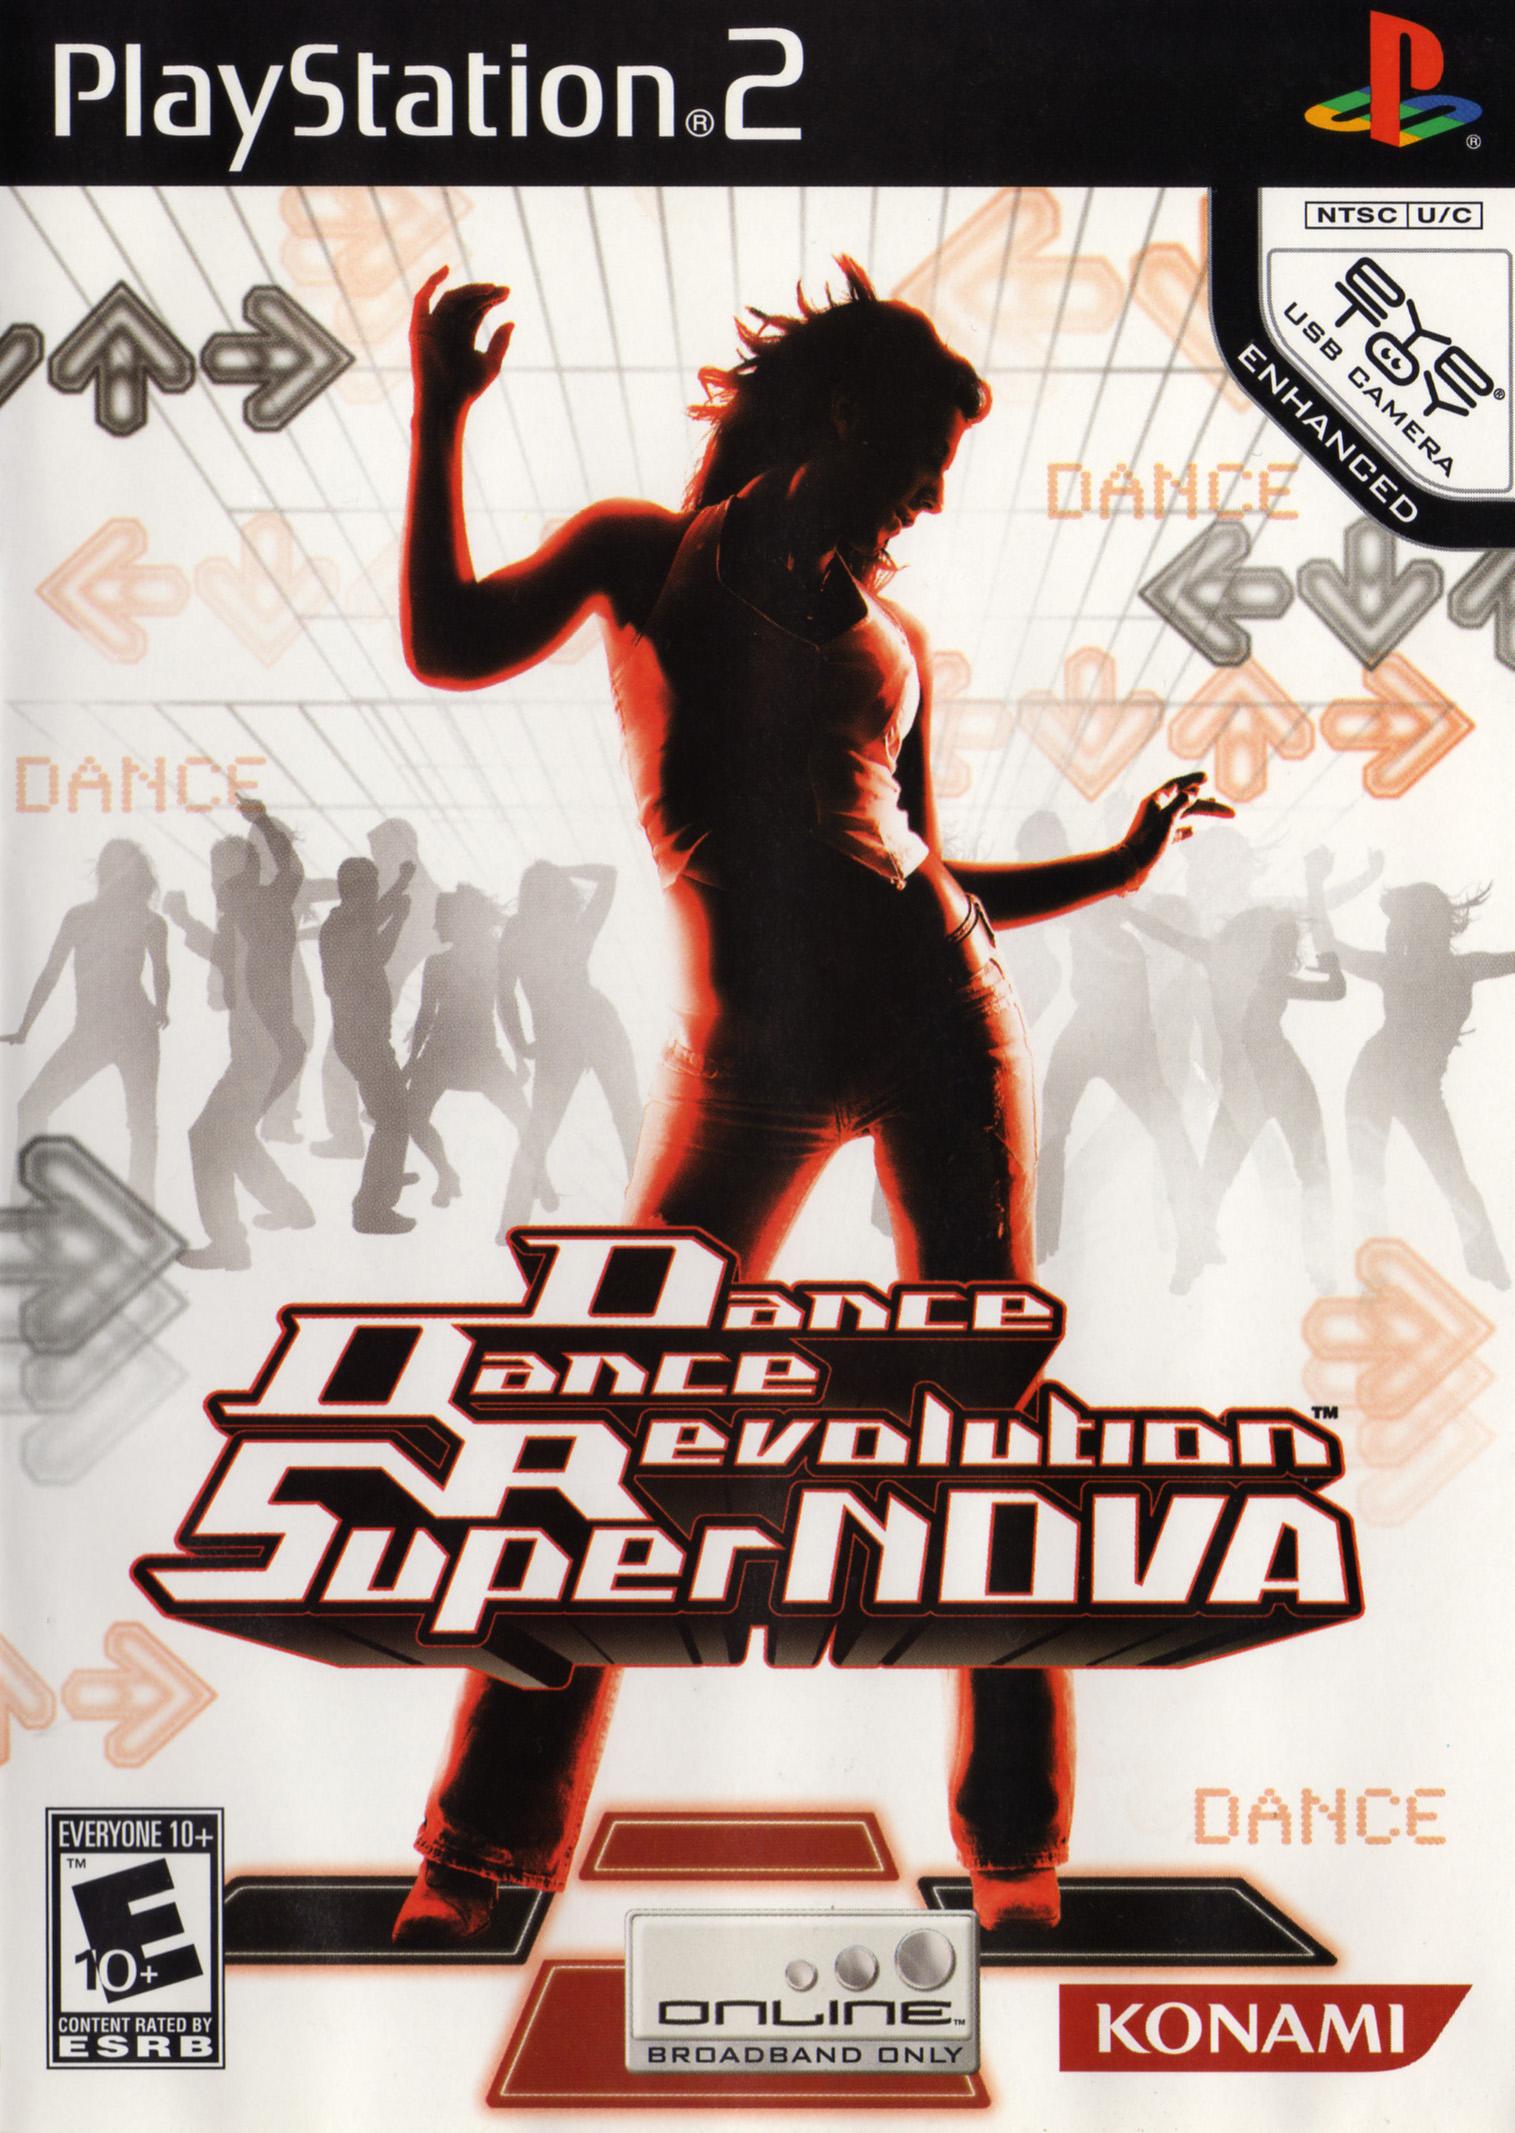 Dance Dance Revolution Supernova (Jeu Seulement) / PS2